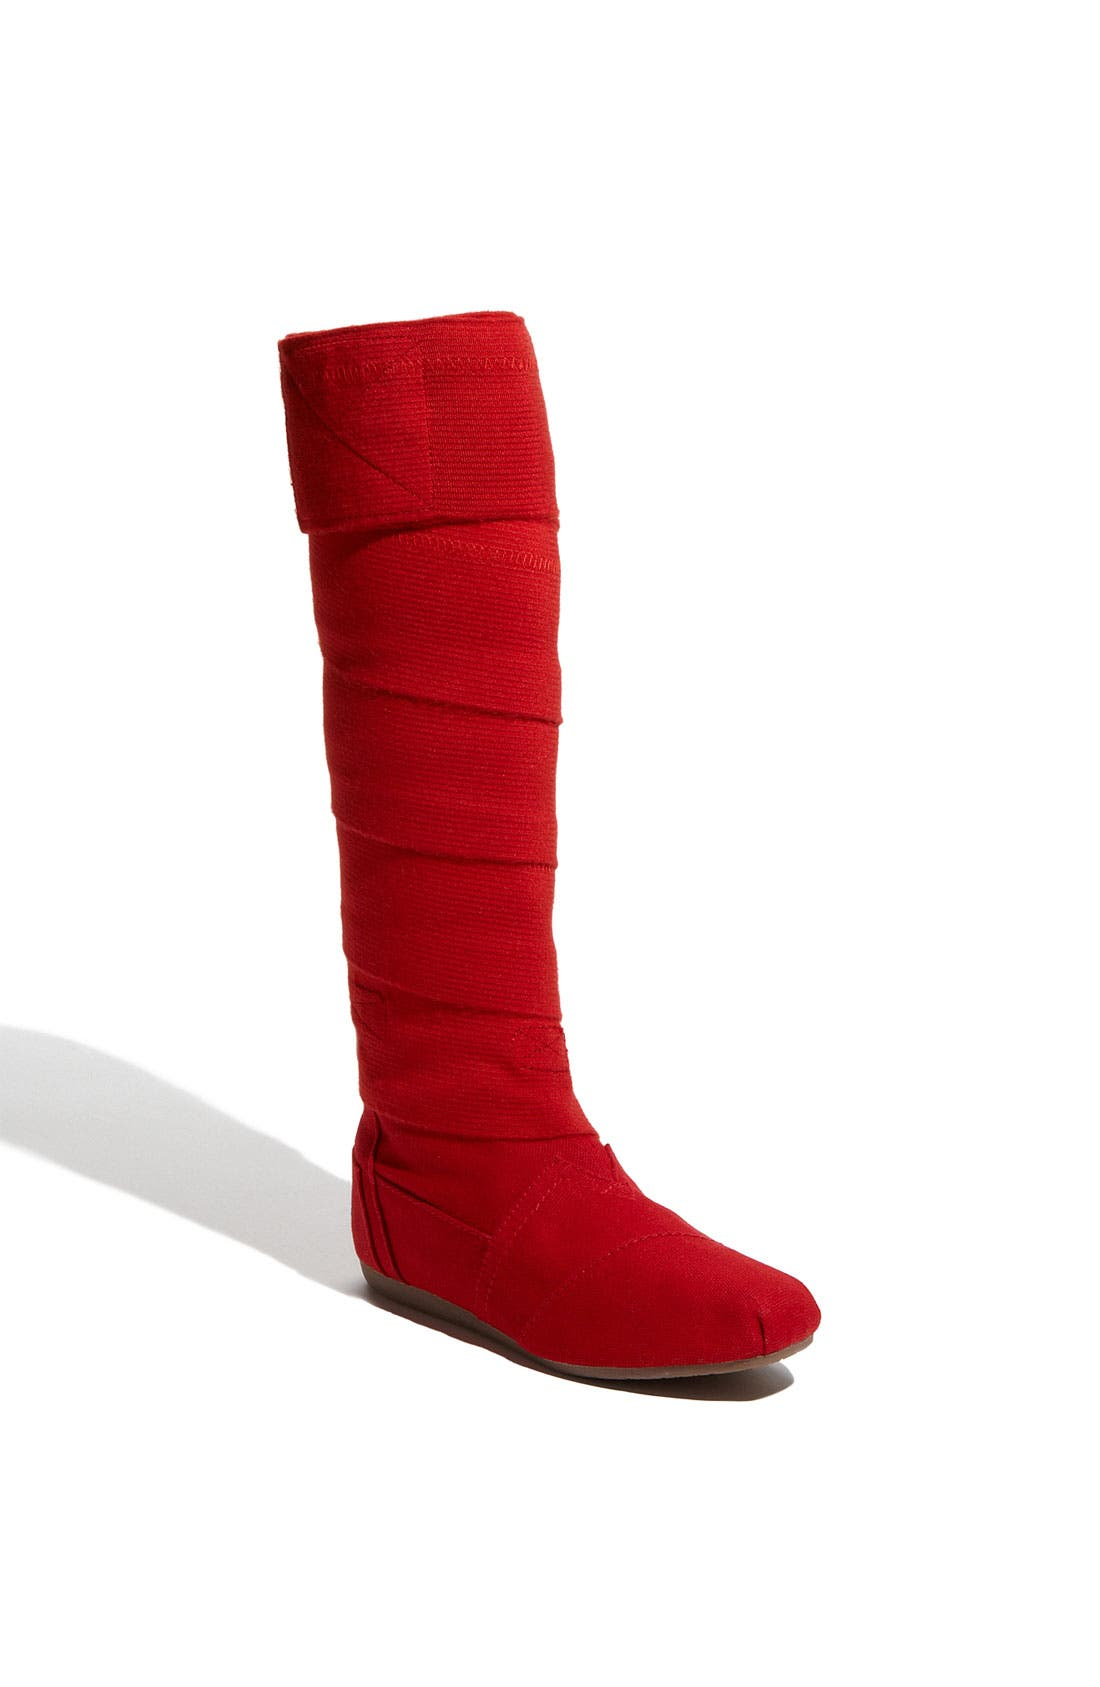 Alternate Image 1 Selected - TOMS 'Wrap' Boot (Women)